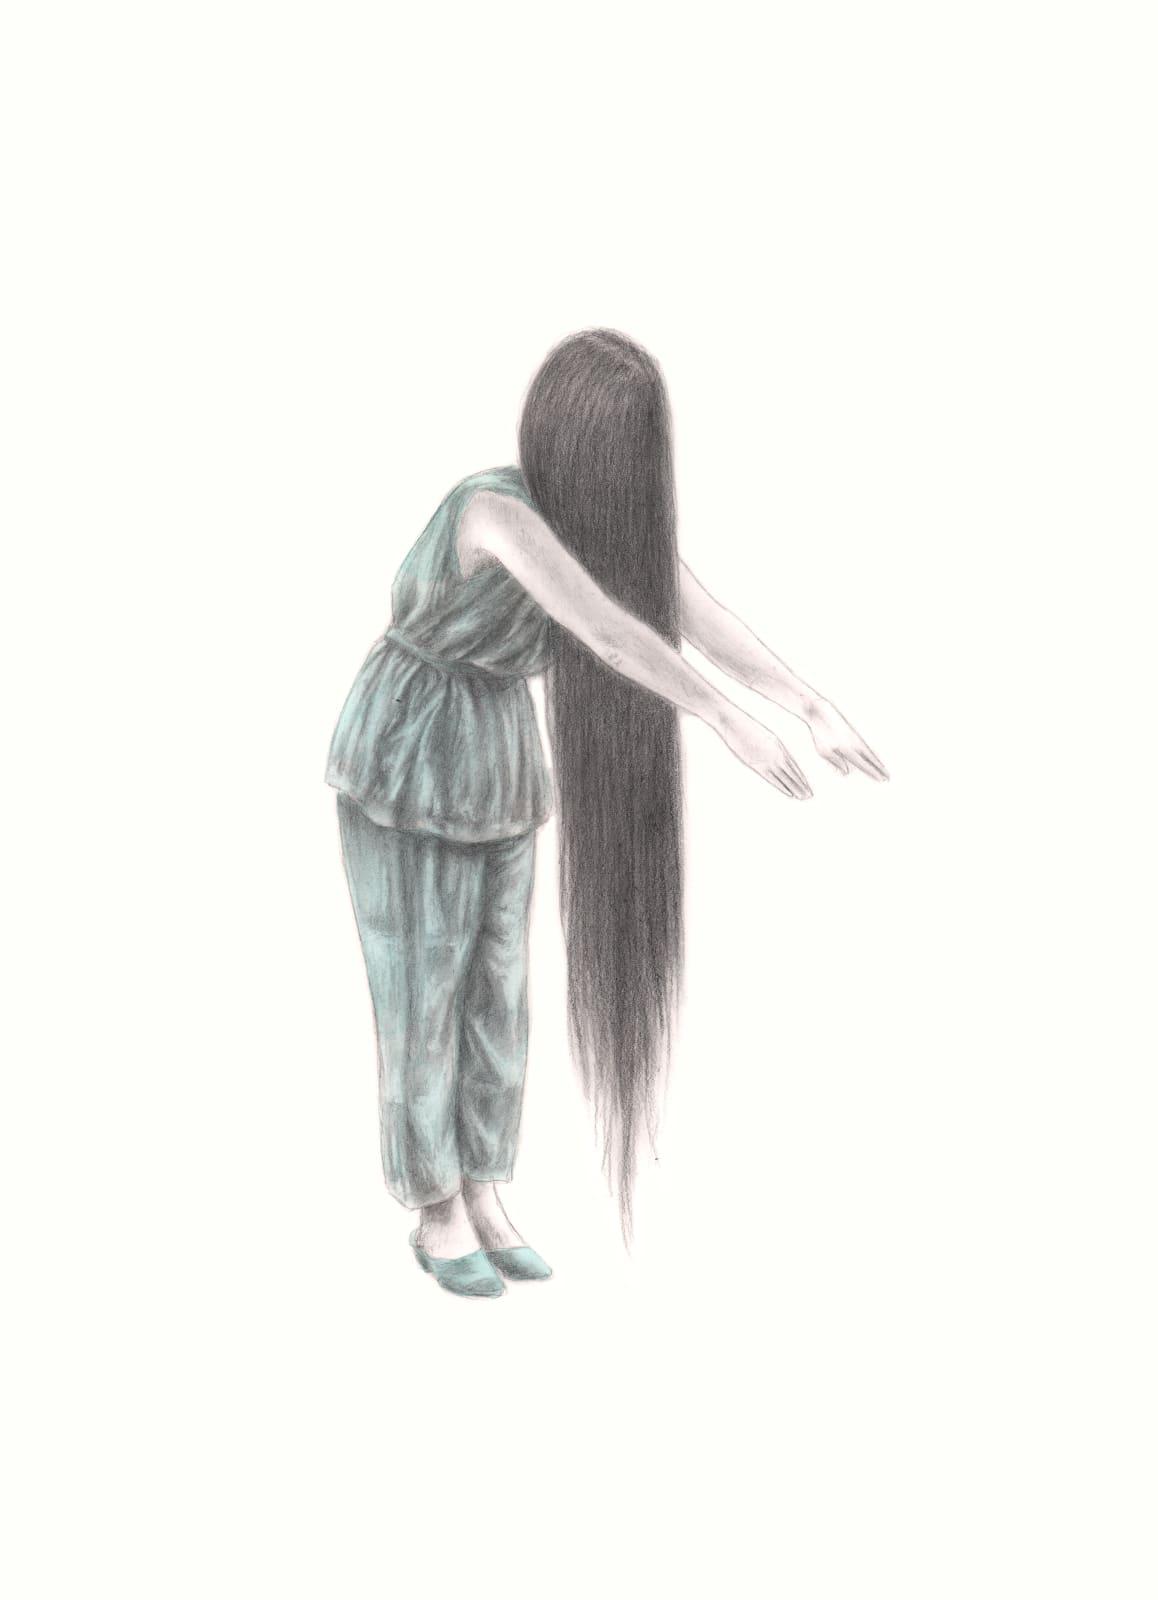 Rachel Goodyear, Long Hair, 2021